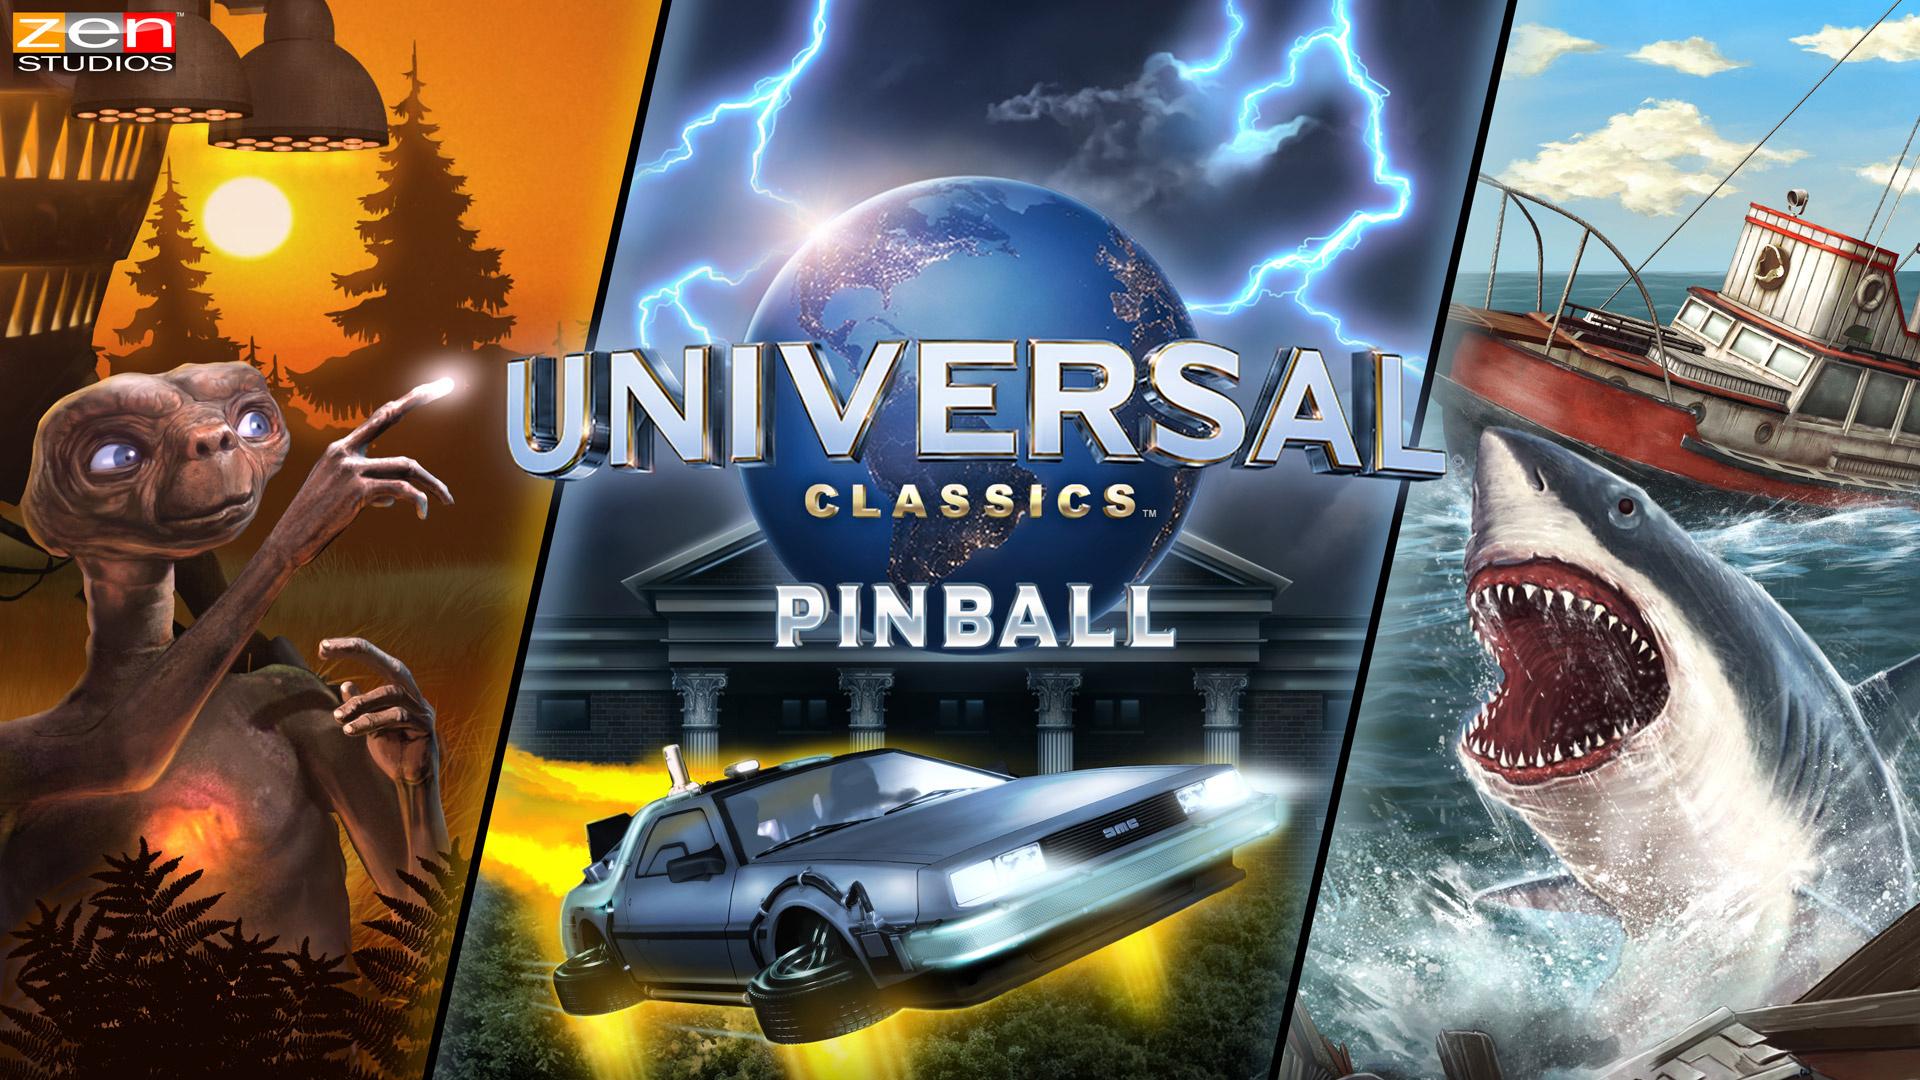 Pinball FX3: Universal Classics Pinball Game Reviews